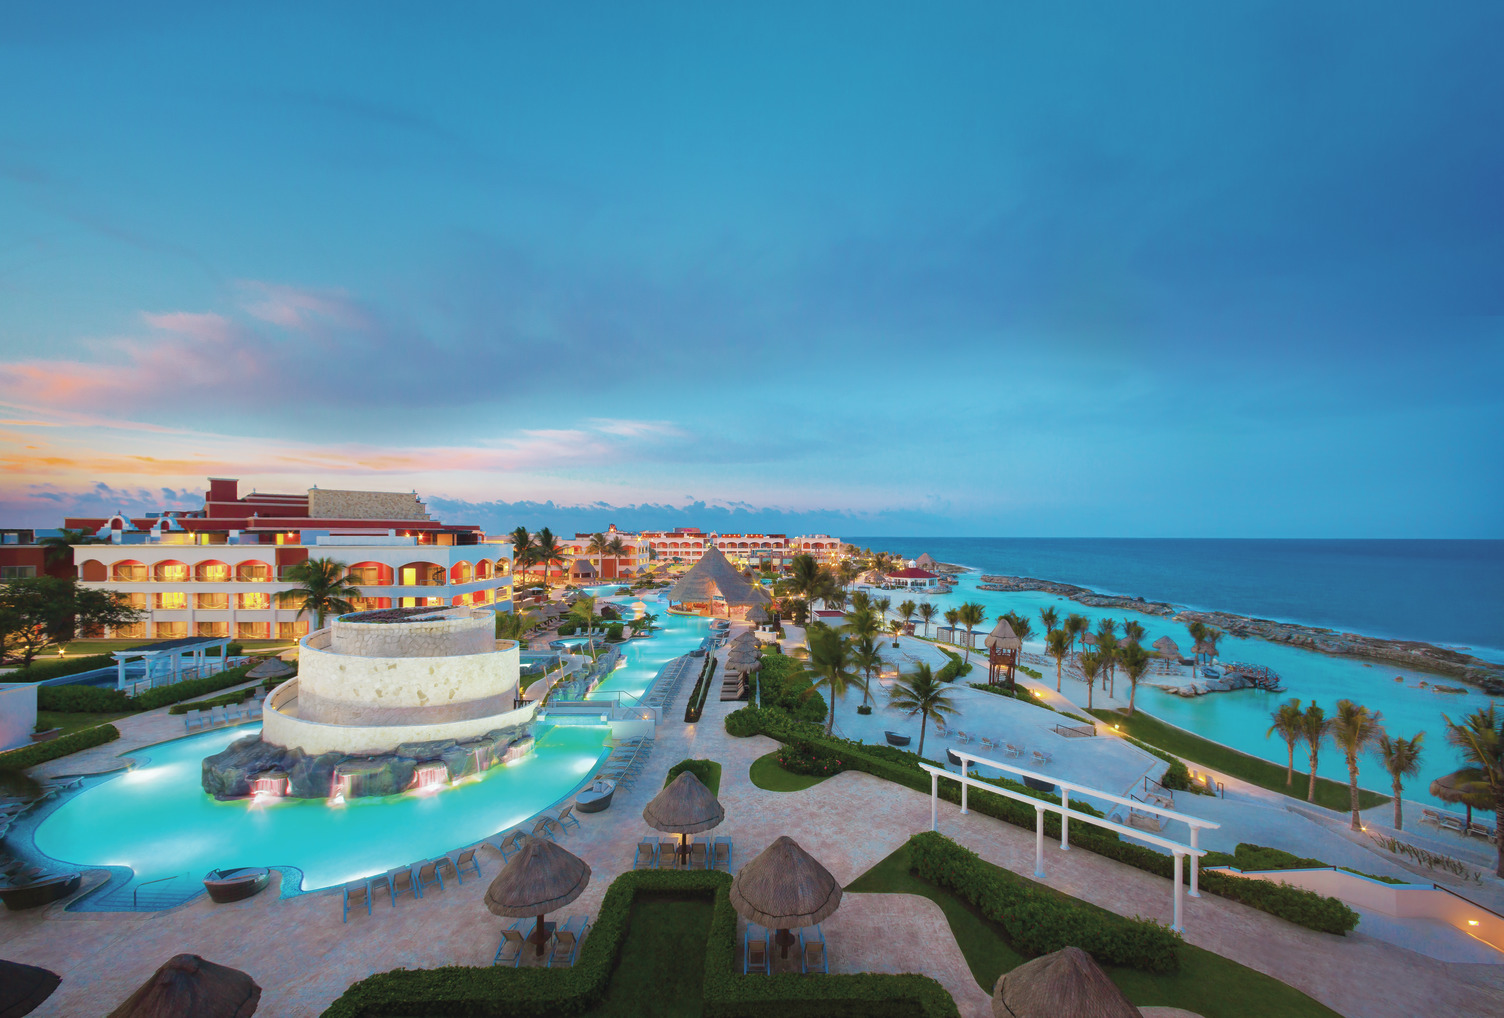 Travel Agency All-Inclusive Resort Heaven at Hard Rock Hotel Riviera Maya 04